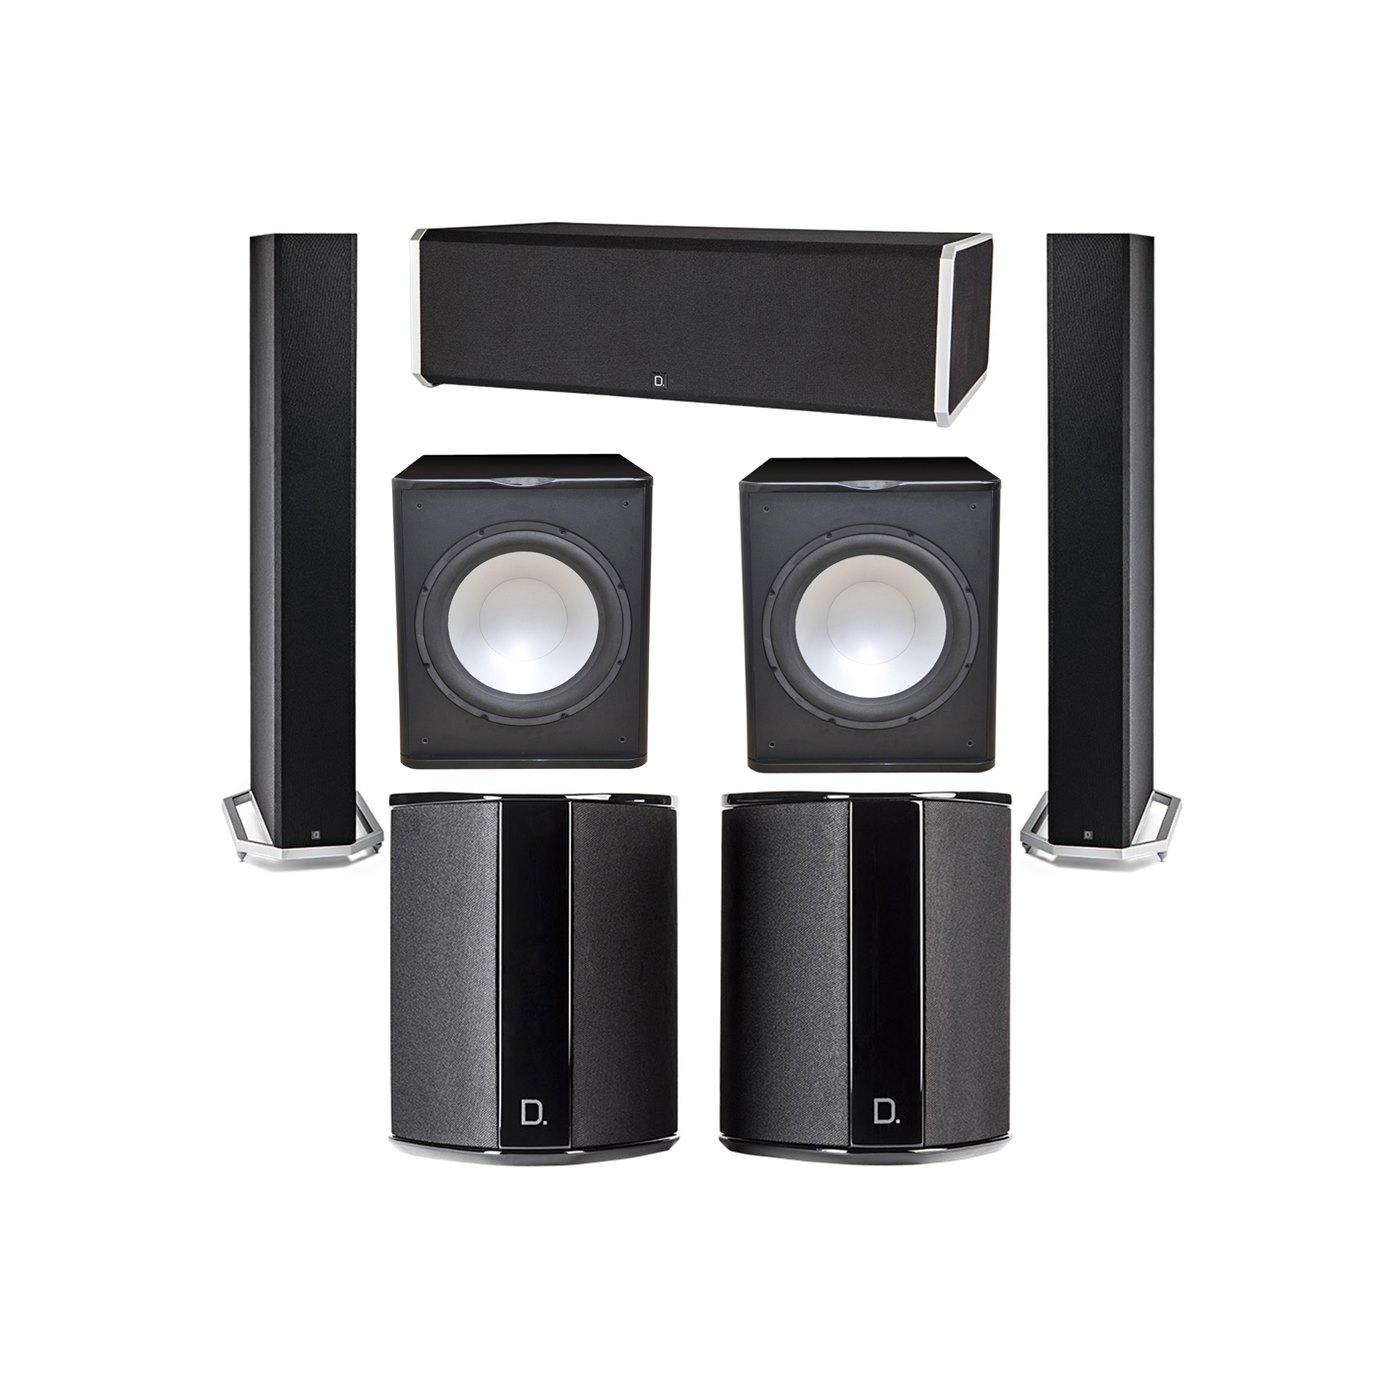 Definitive Technology 5.2 System with 2 BP9060 Tower Speakers, 1 CS9080 Center Channel Speaker, 2 SR9040 Surround Speaker, 2 Premier Acoustic PA-150 Subwoofer